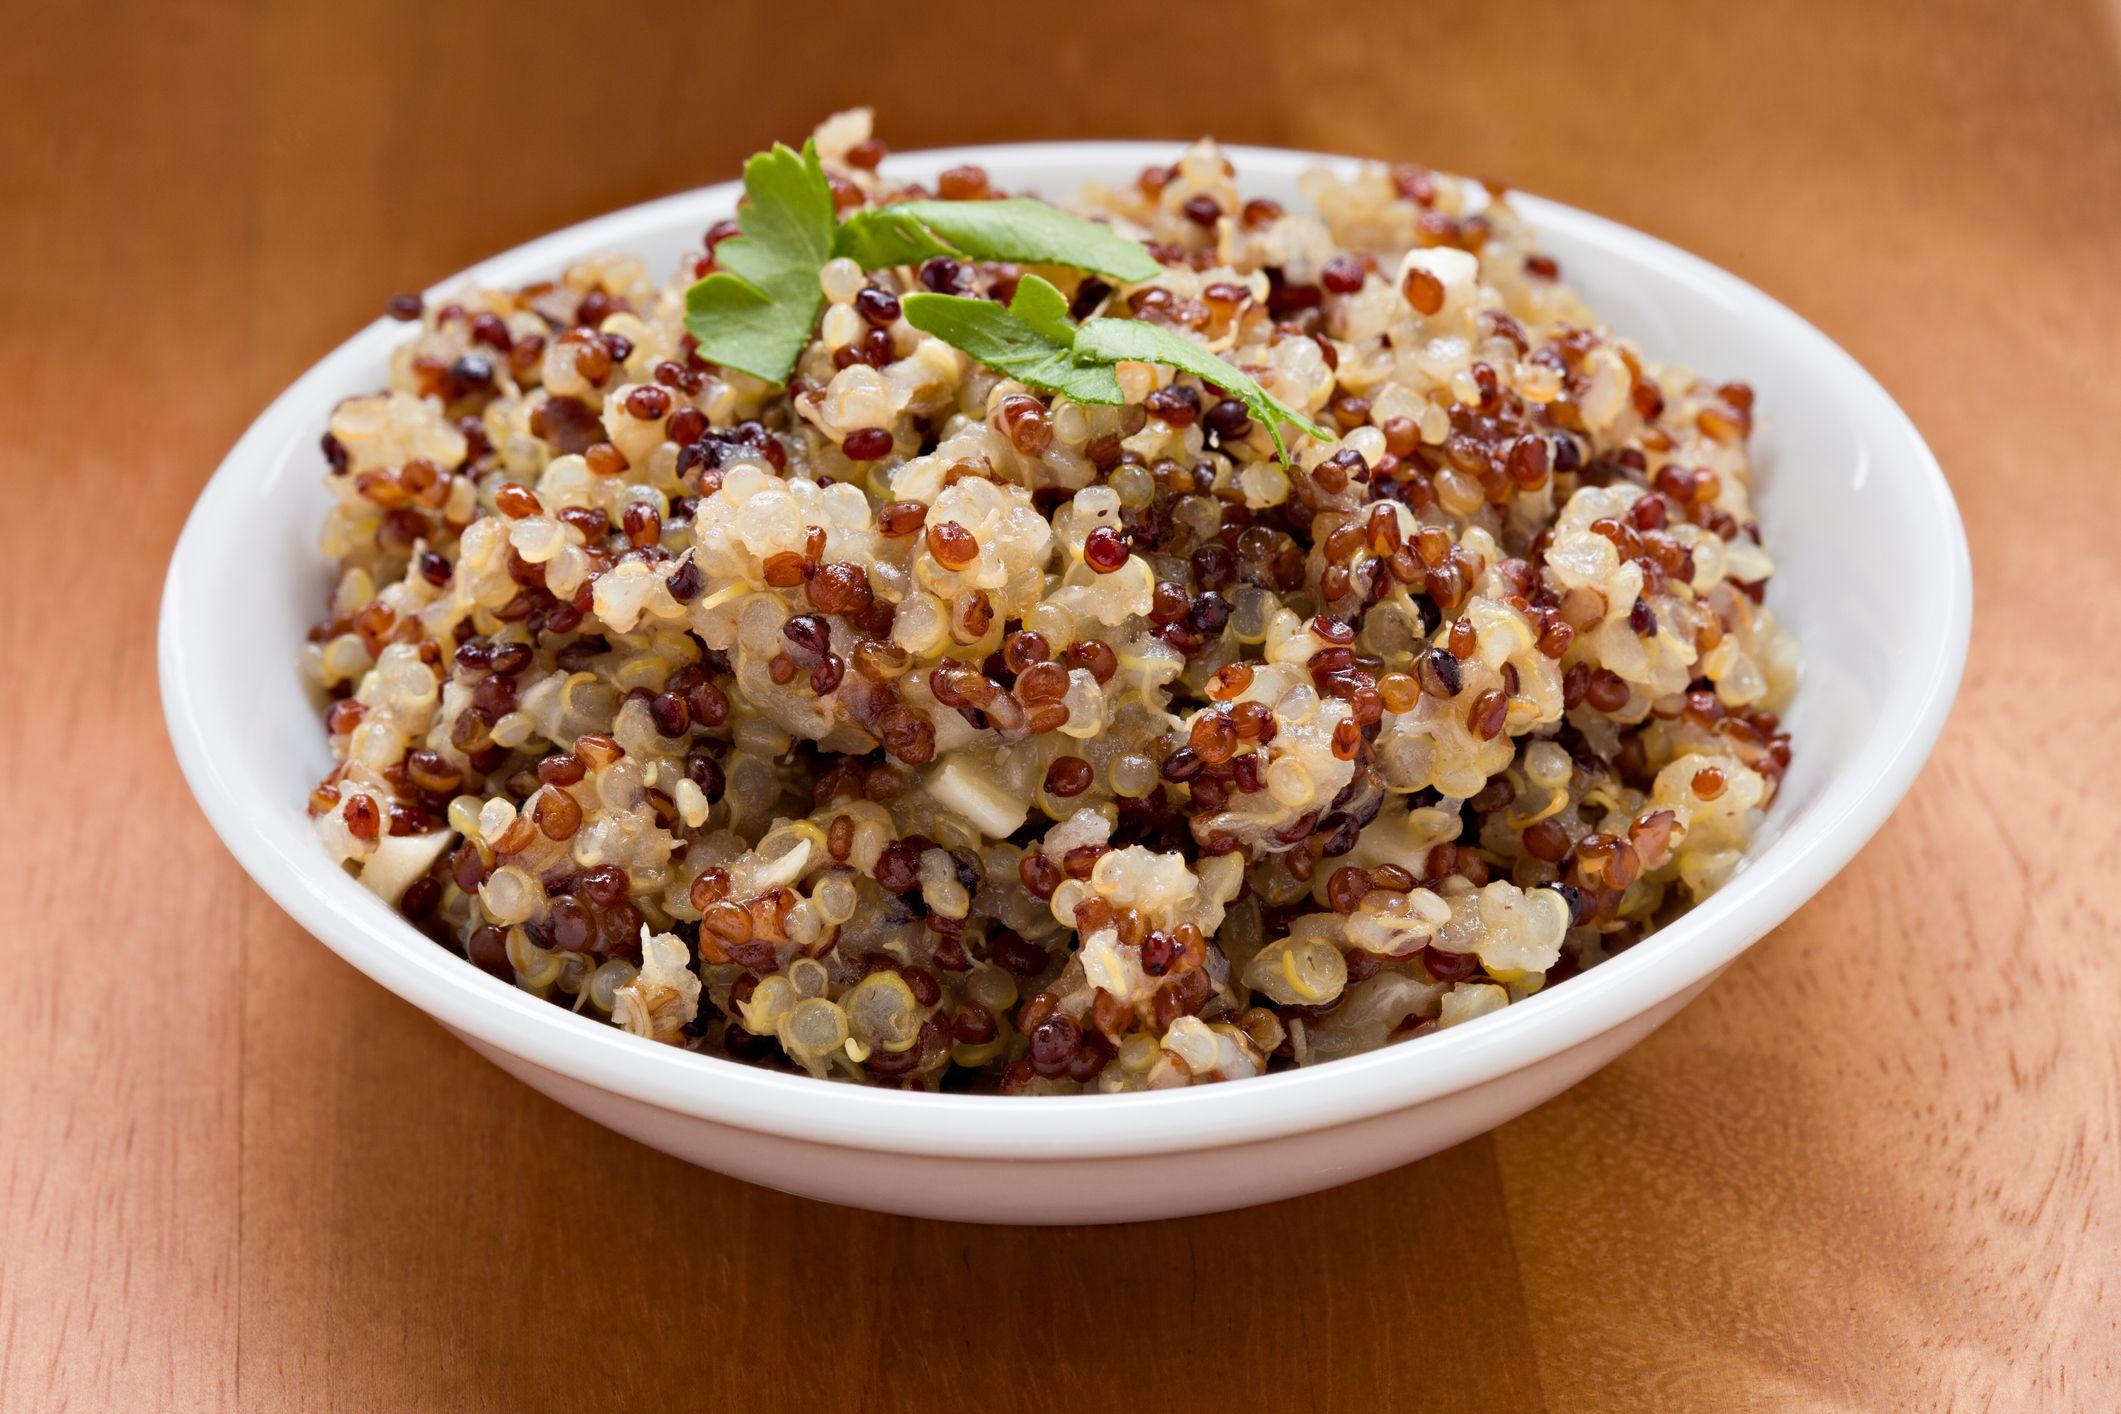 Quinoa-GettyImages-185107863-586ab6a45f9b586e02ab5134